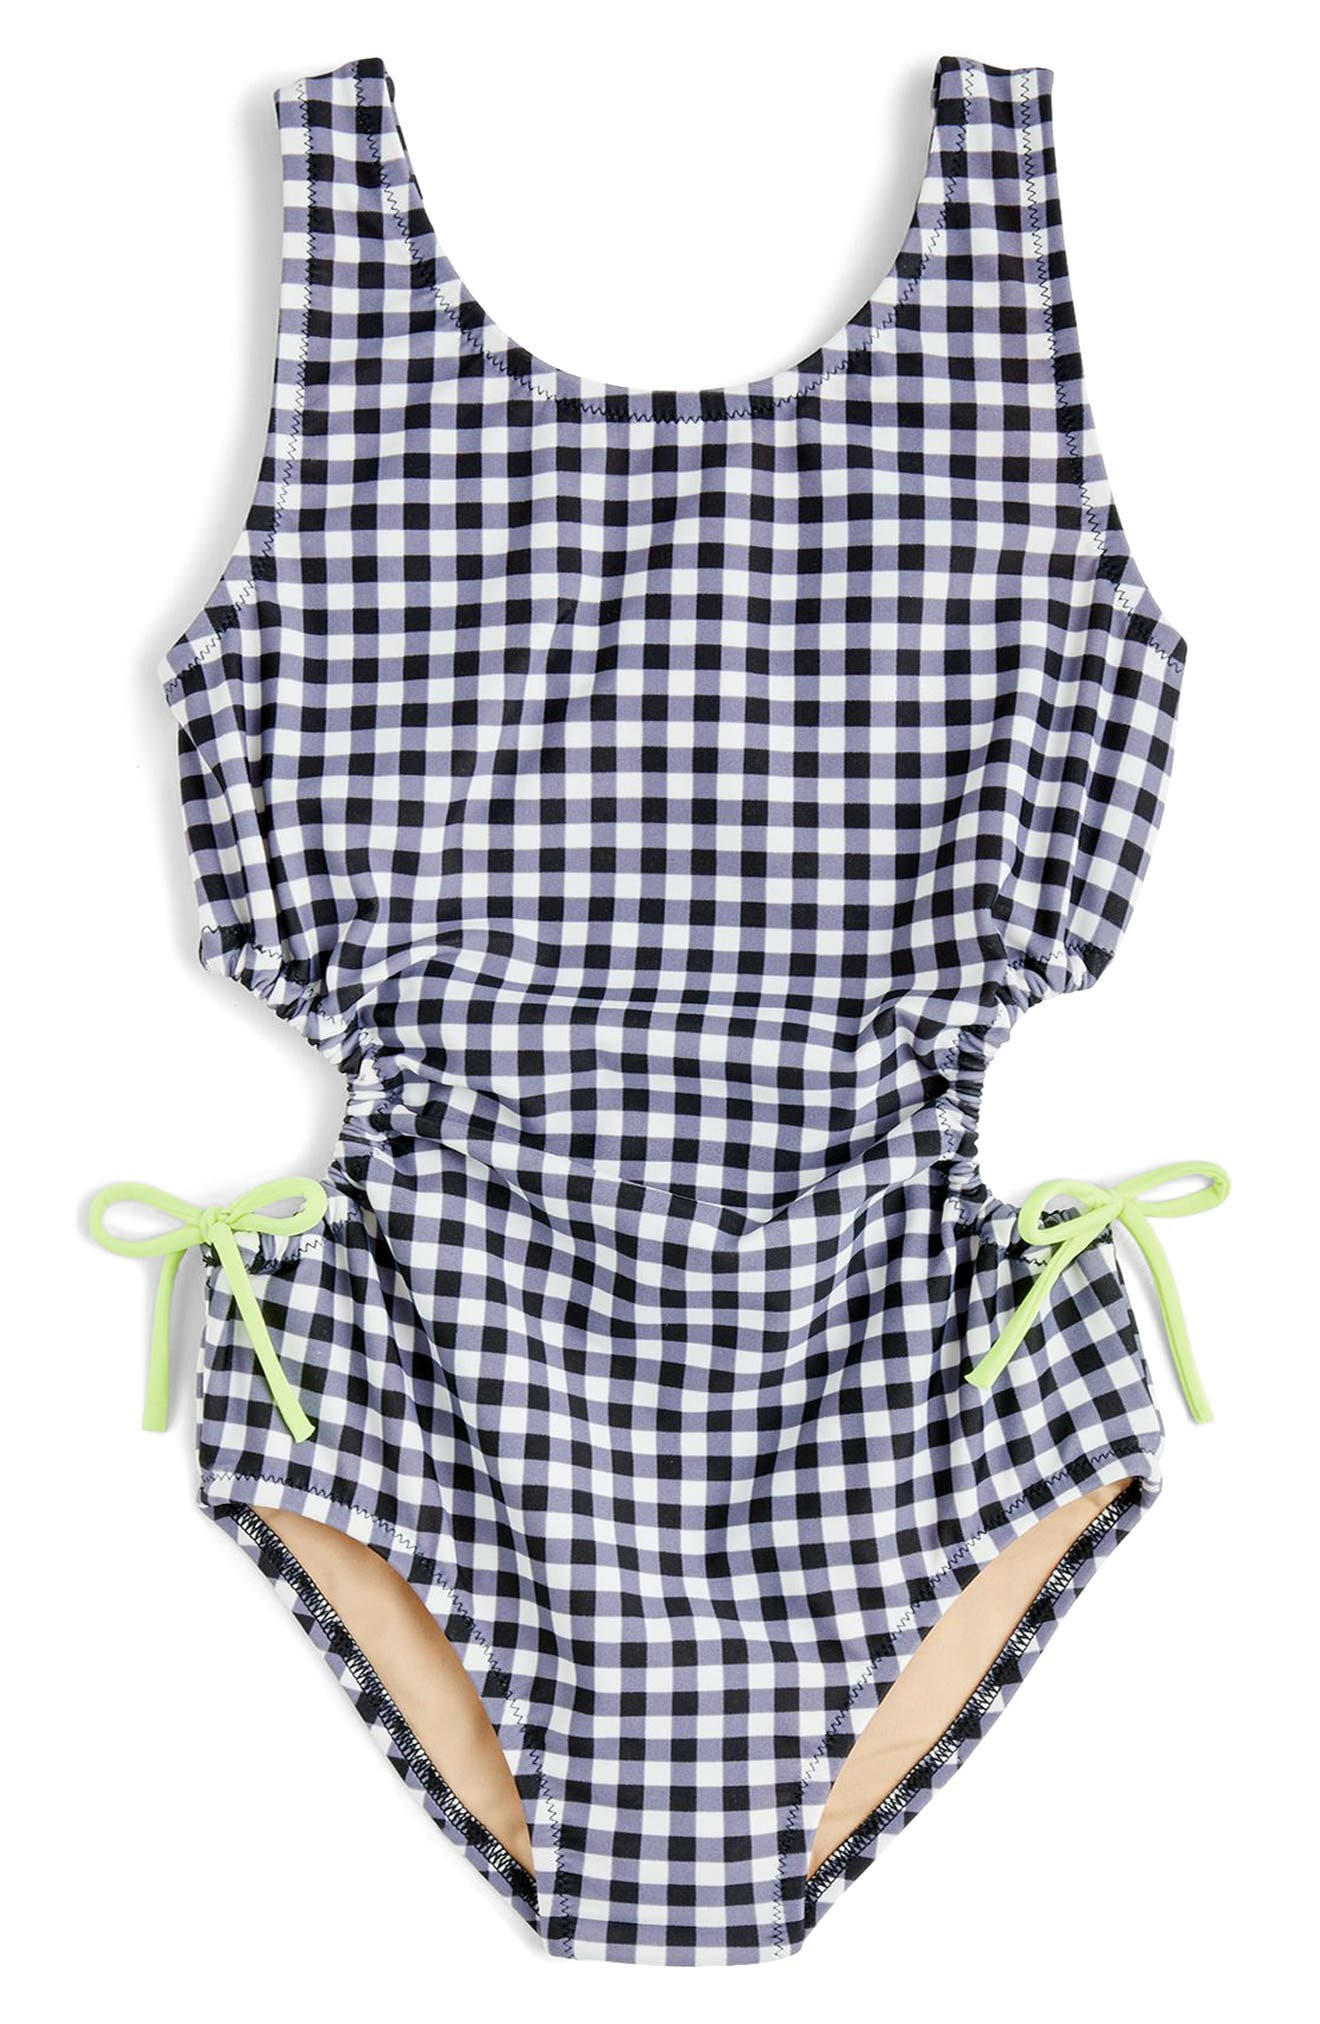 Clara Gingham One-Piece Swimsuit,                         Main,                         color, Black White Multi